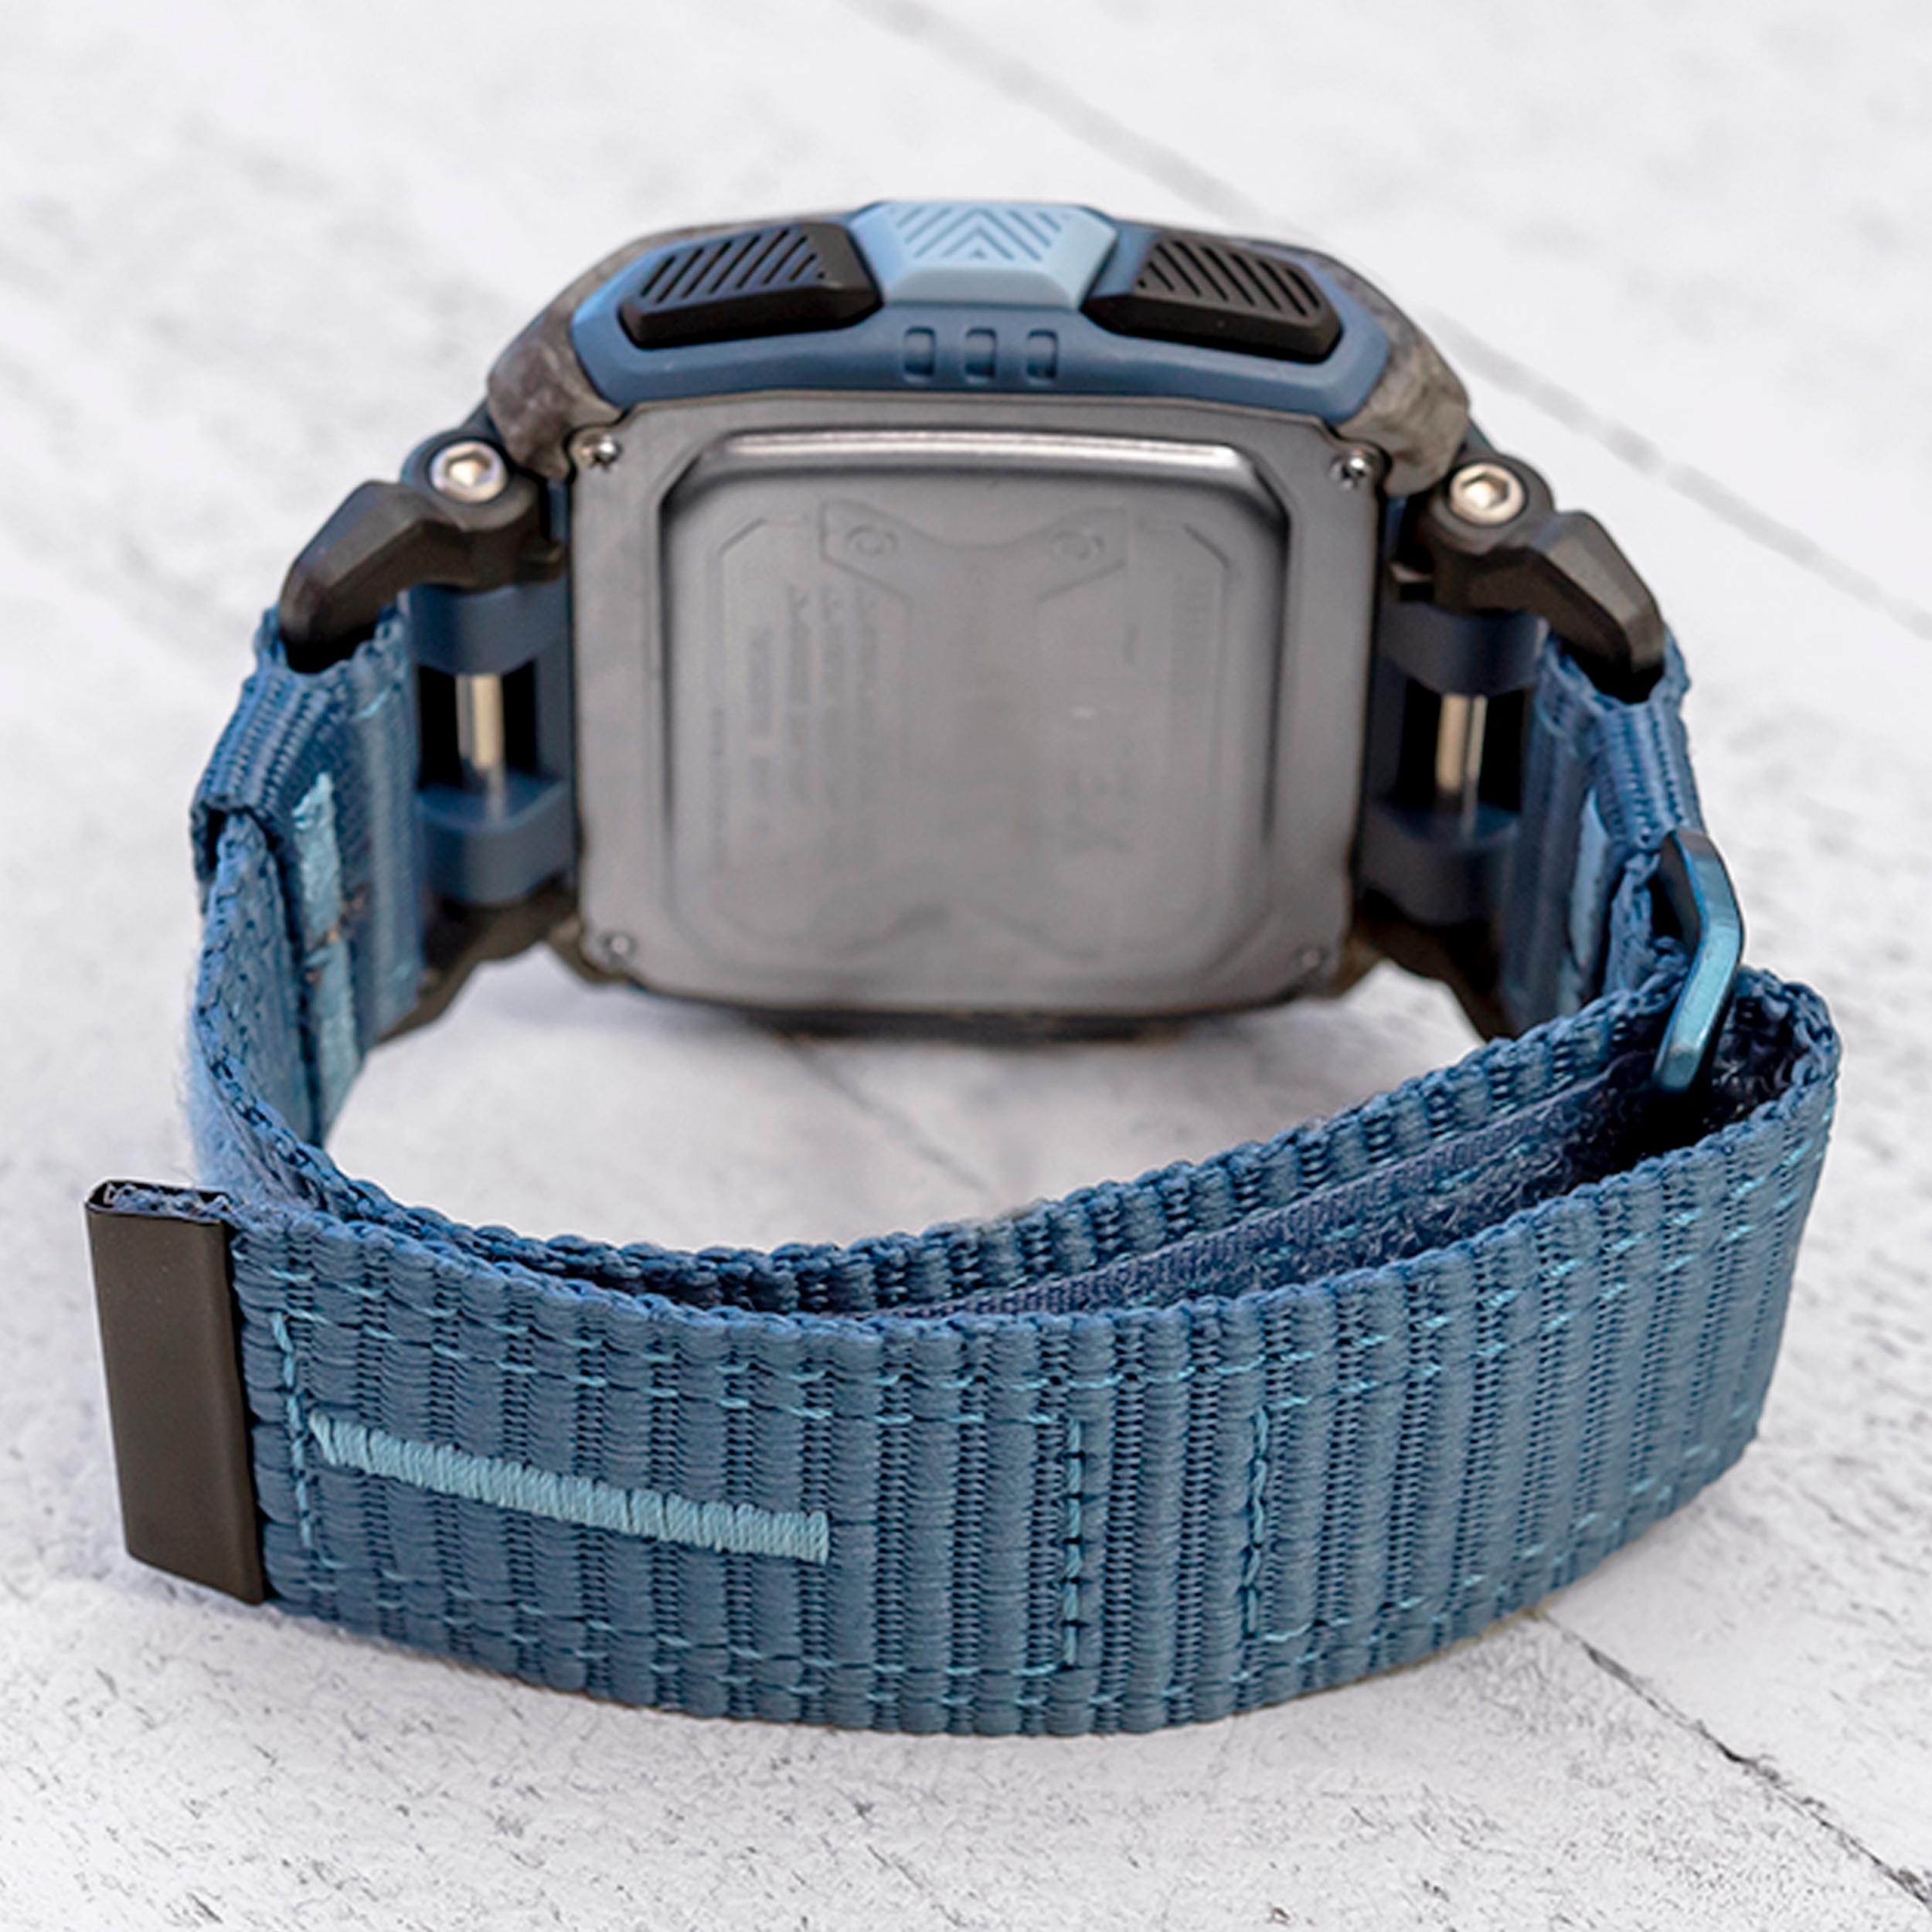 ساعت مچی دیجیتال مردانه تایمکس مدل TW5M28700 -  - 1